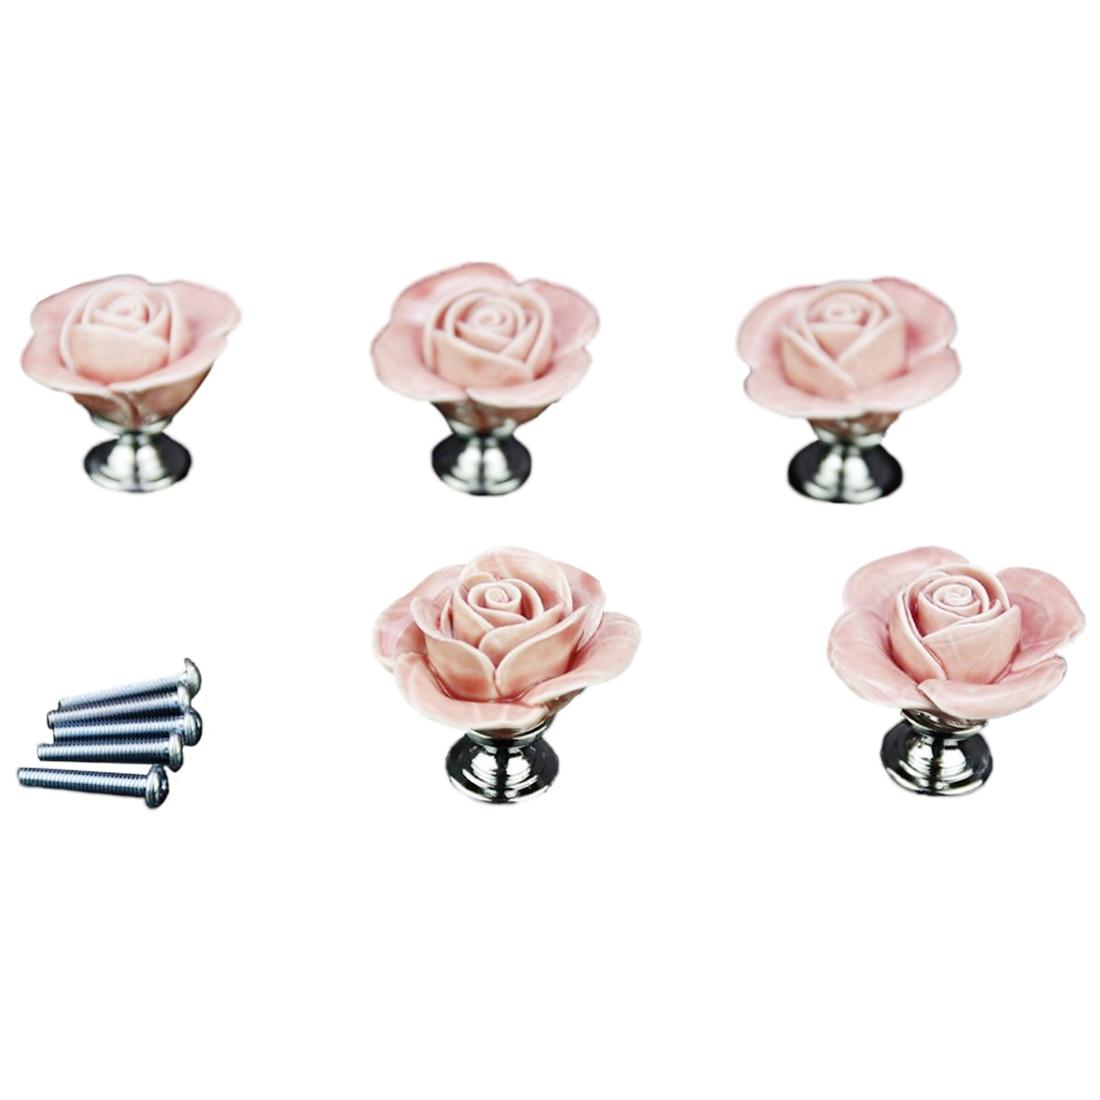 5 x Pink Door Furniture Ceramic Handle Antique Button Screws Included Elegant Design Rose shaped european modern bronze doors handle chinese antique glass door handle door handle carving